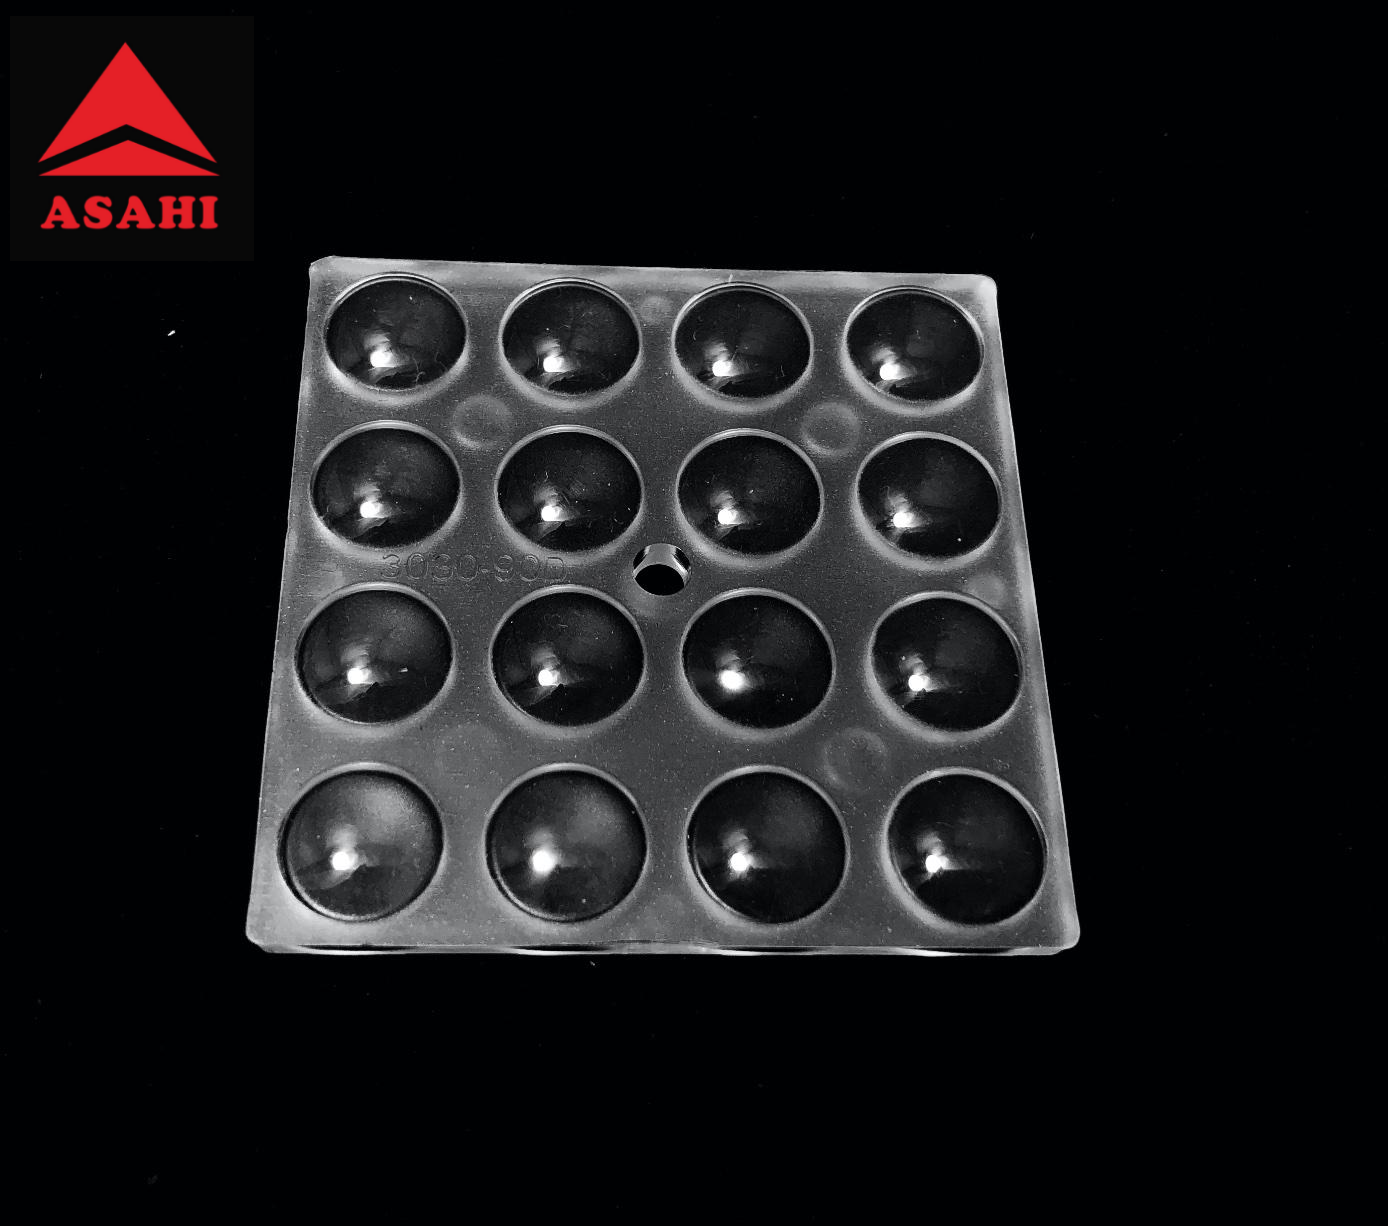 16LEDs optical lens for 3030LED beam 90 degree produce great optical performance 1